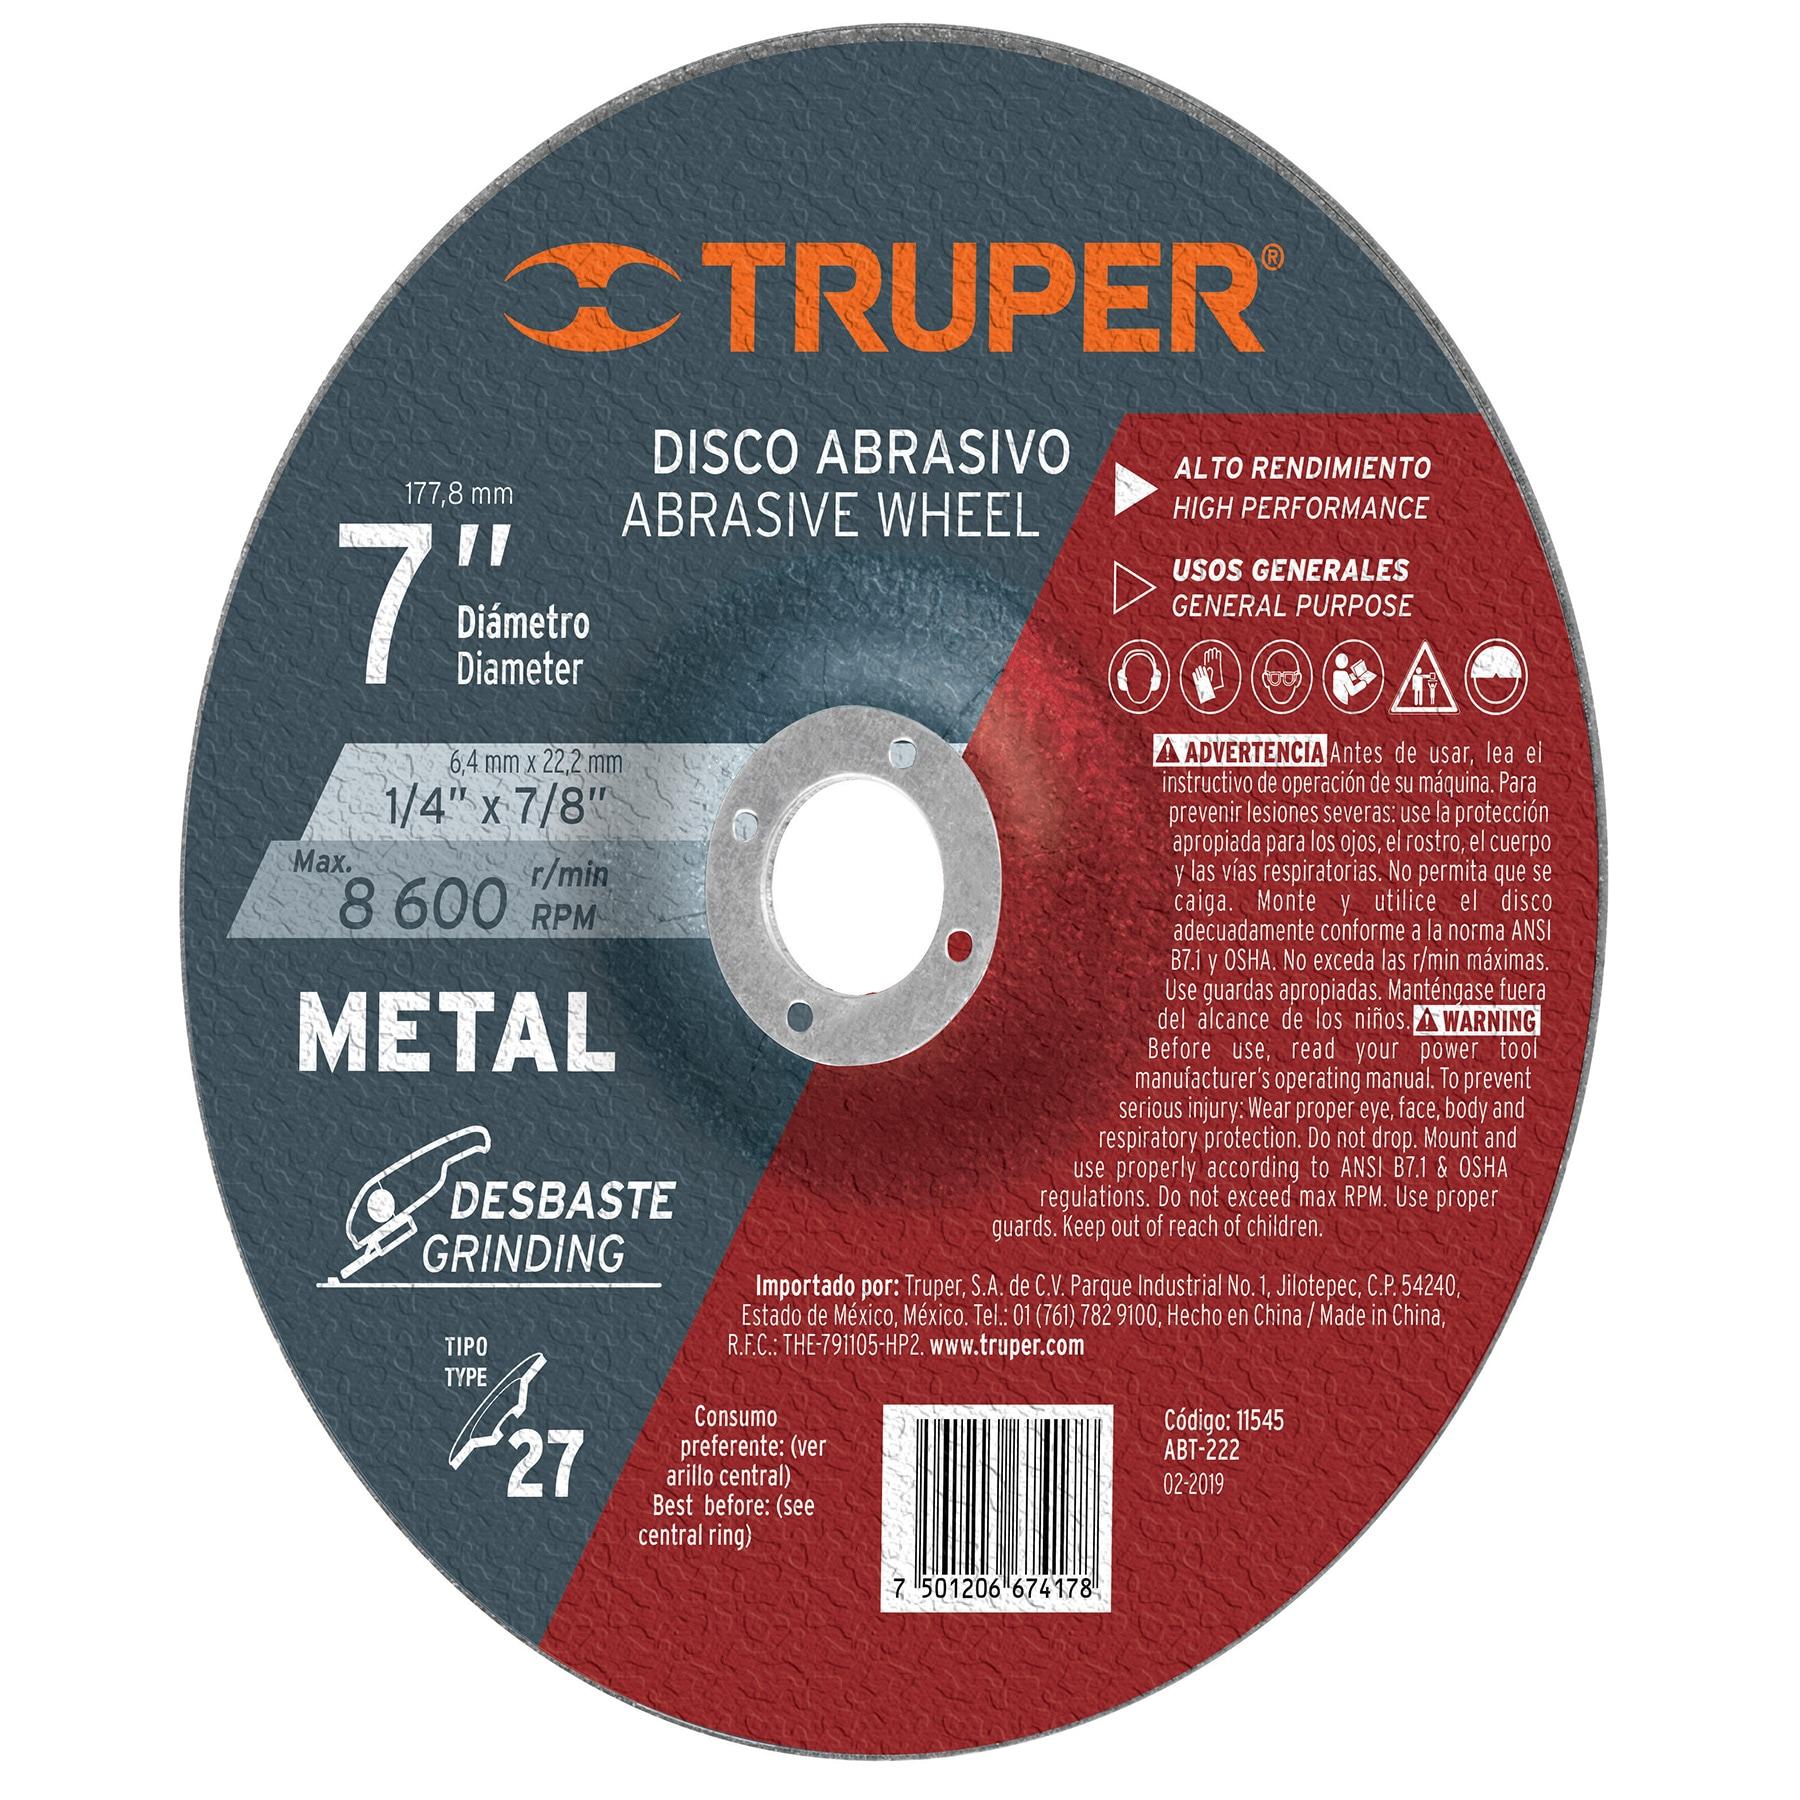 Disco desbaste metal, tipo27,diámetro 7',alto rendimiento